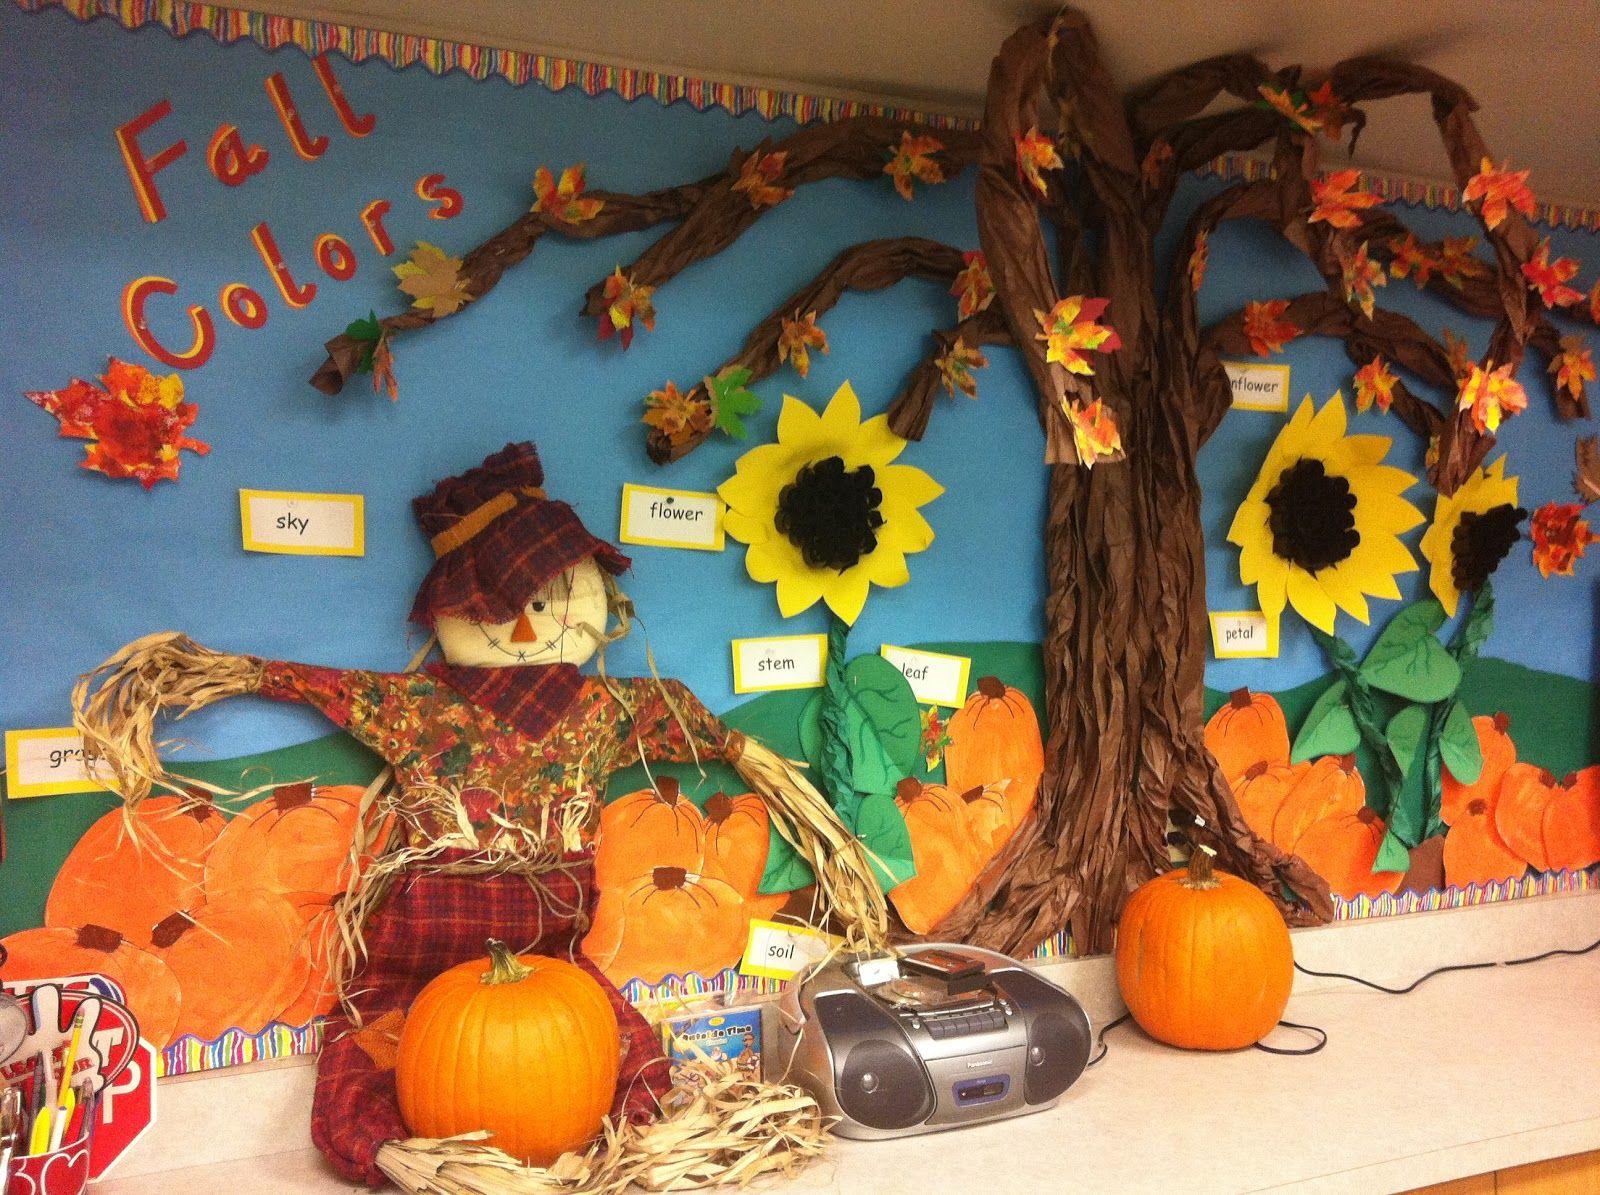 Preschool Classroom Fall Decorations : Little miss hood s adventures in kindergarten fall